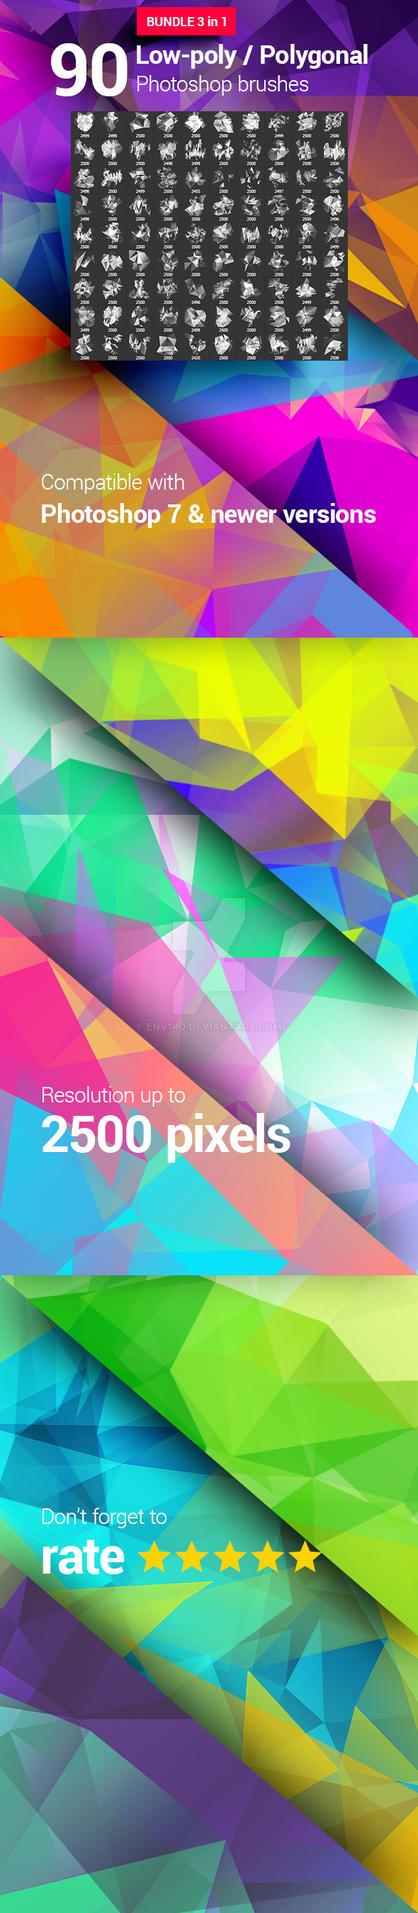 90 Polygonal / Geometrical Photoshop Brushes by env1ro